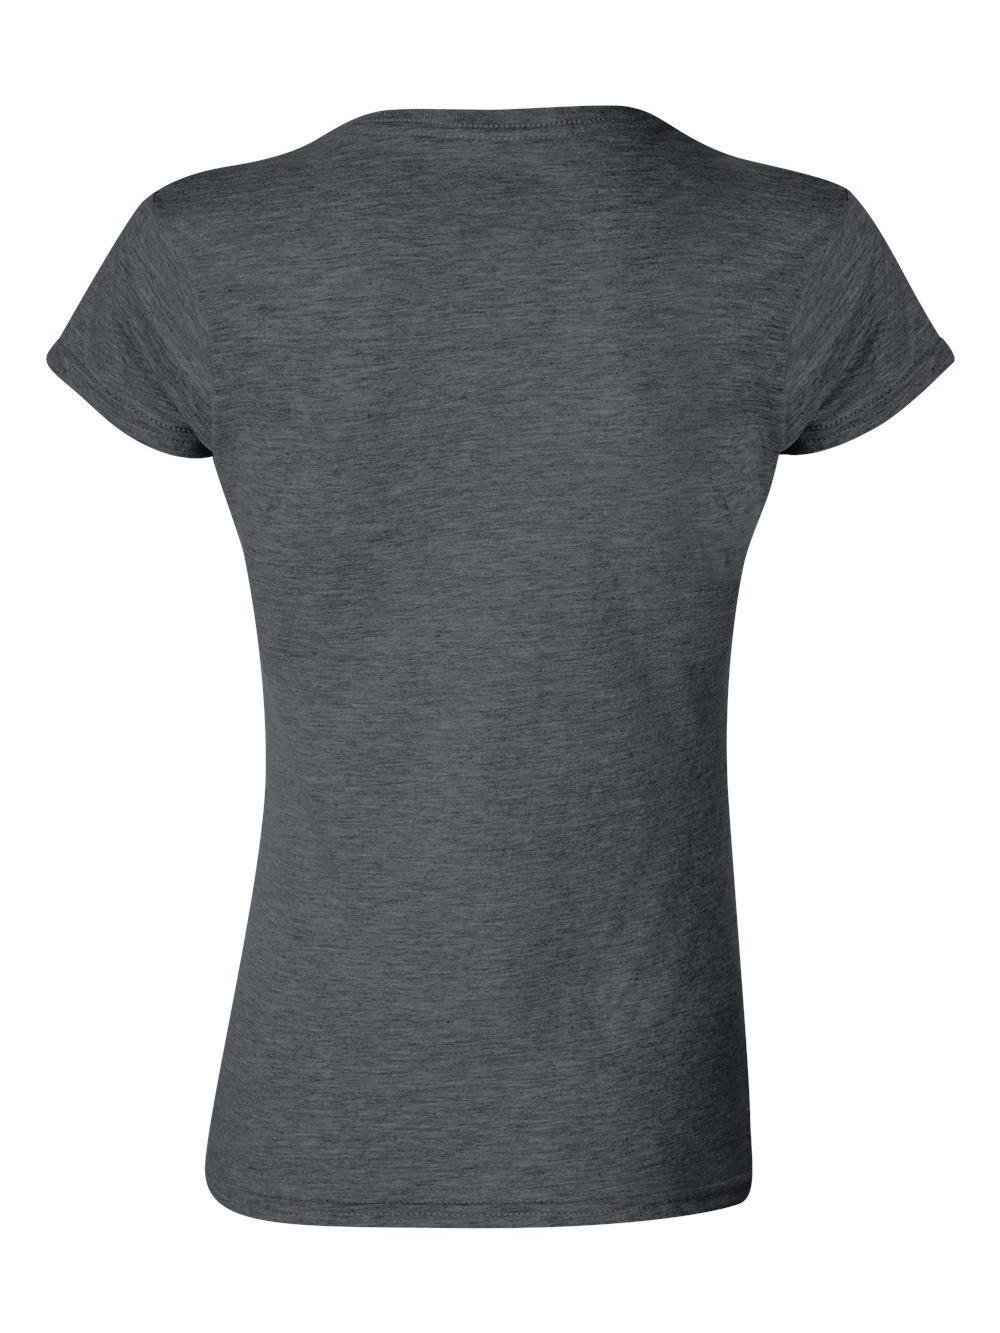 Gildan-Softstyle-Women-039-s-T-Shirt-64000L thumbnail 19